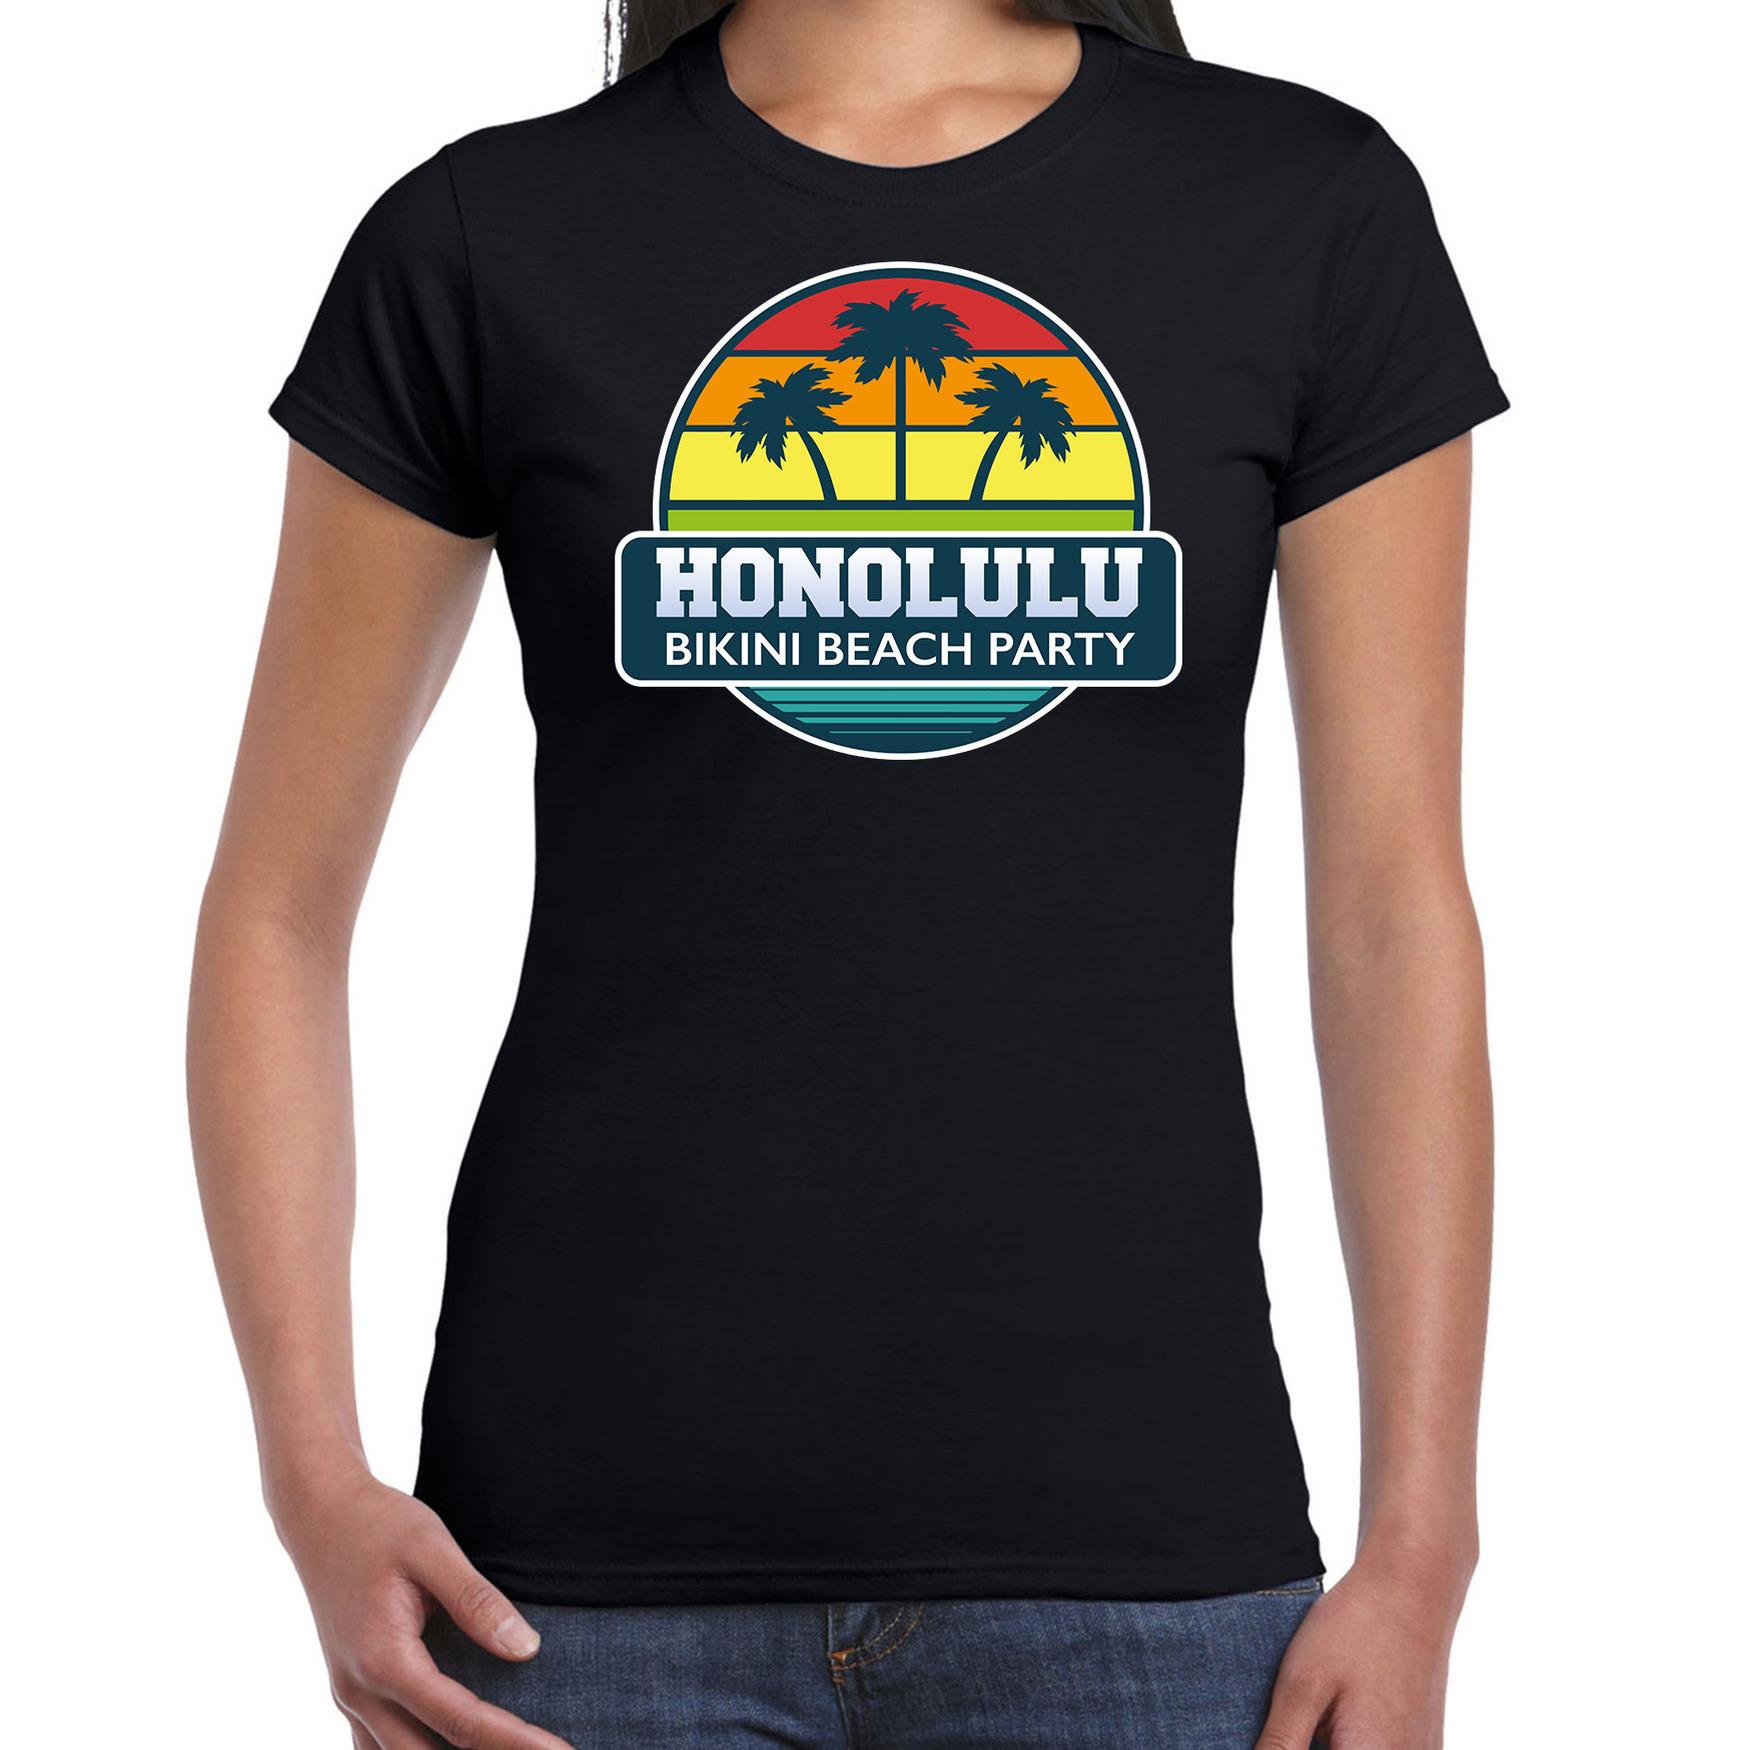 Honolulu bikini beach party shirt beach - strandfeest vakantie outfit - kleding zwart voor dames